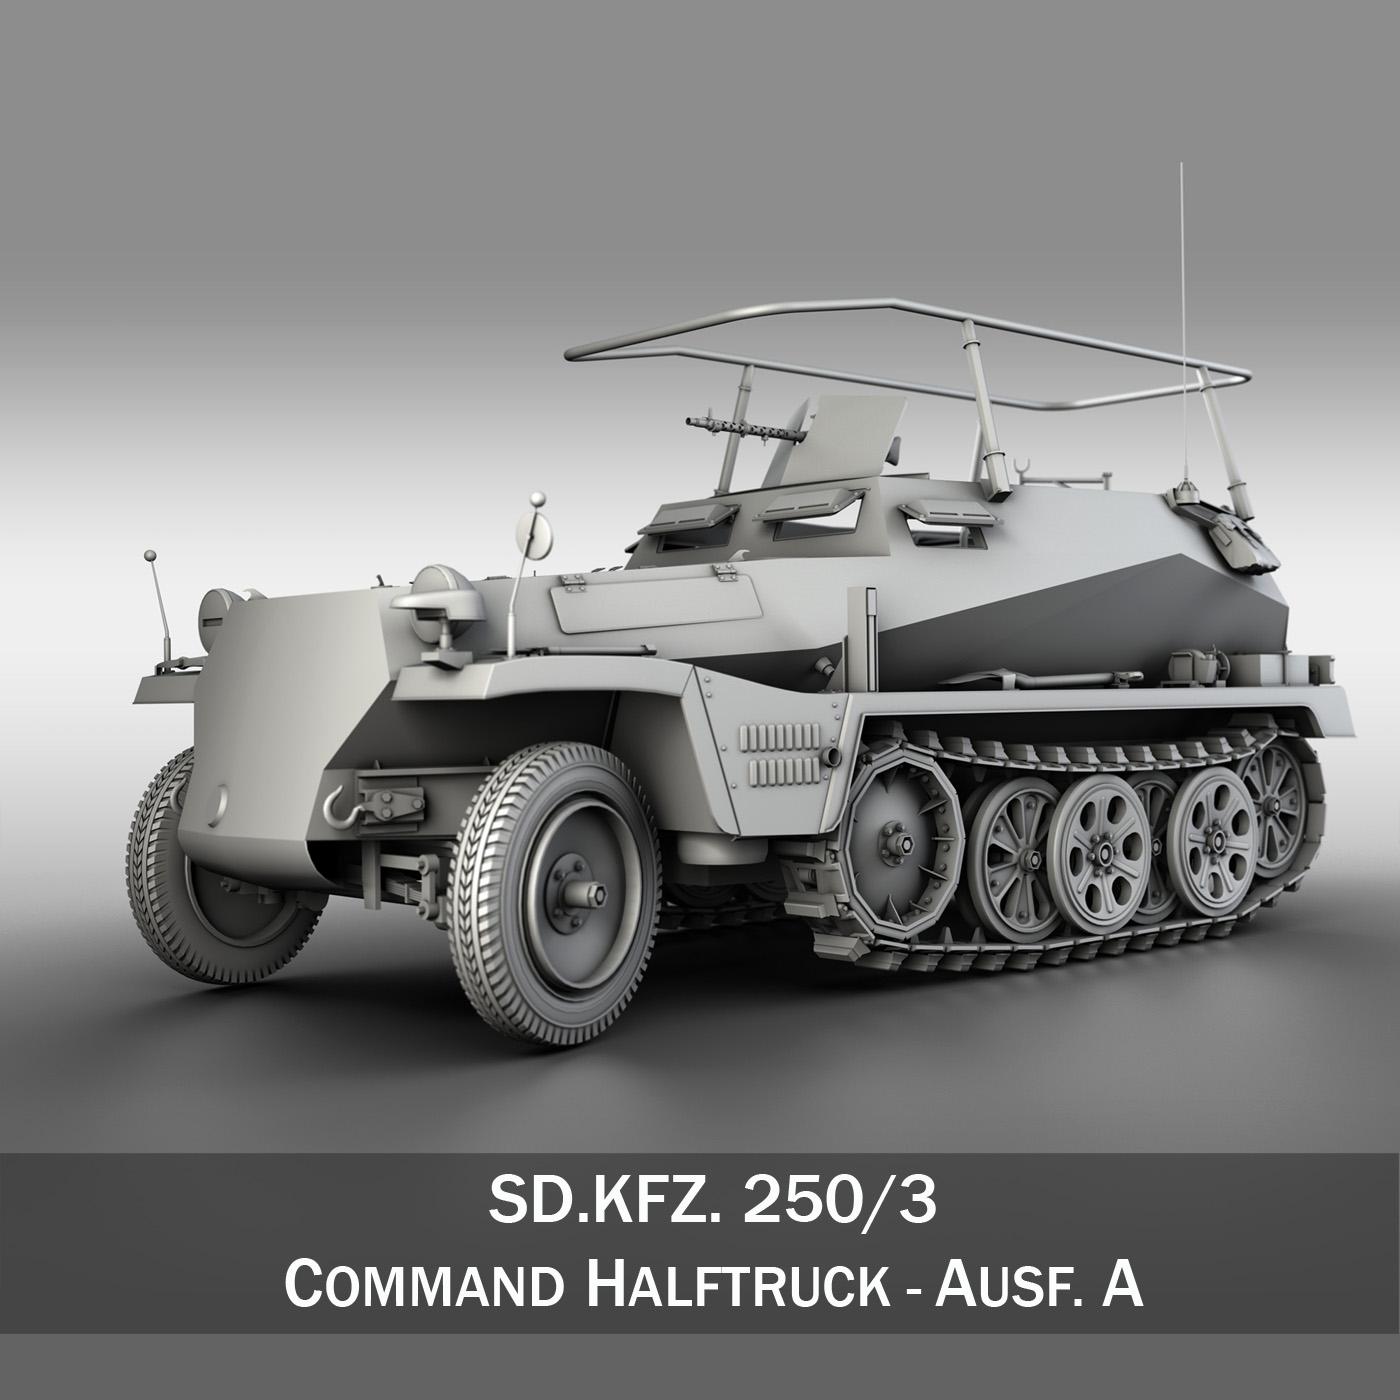 sdkfz 250 – command halftrack 3d model 3ds fbx c4d lwo obj 251669